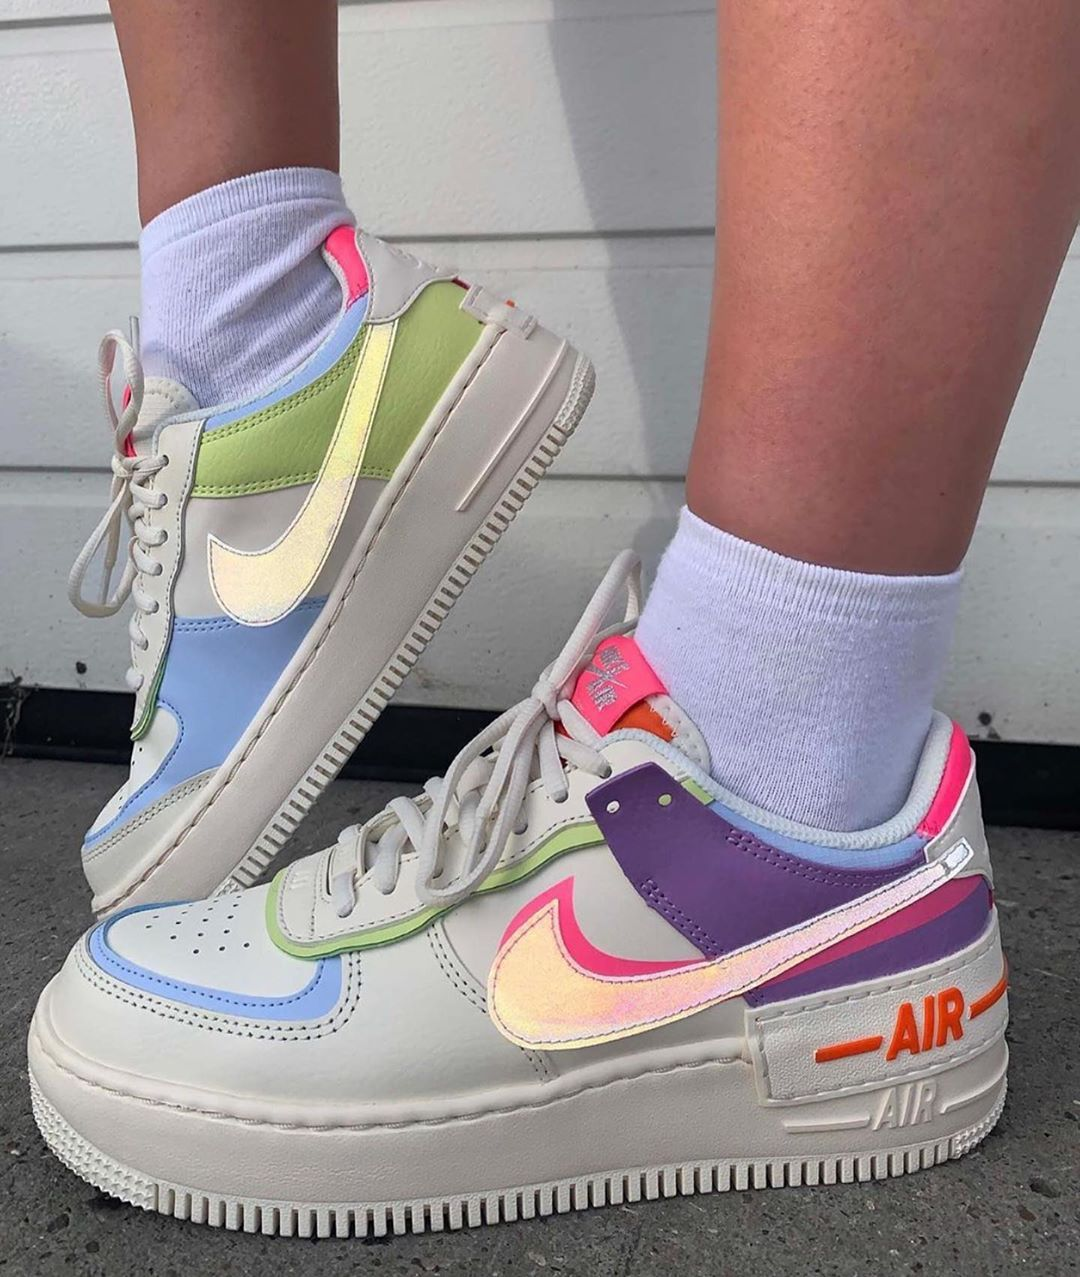 Kingwalk Es On Instagram Nike Air Force One Shadow Por Tan Solo 59 95 Te Gustan A Nosotros Nos Encantan In 2020 Nike Air Shoes Hype Shoes Nike Shoes Women